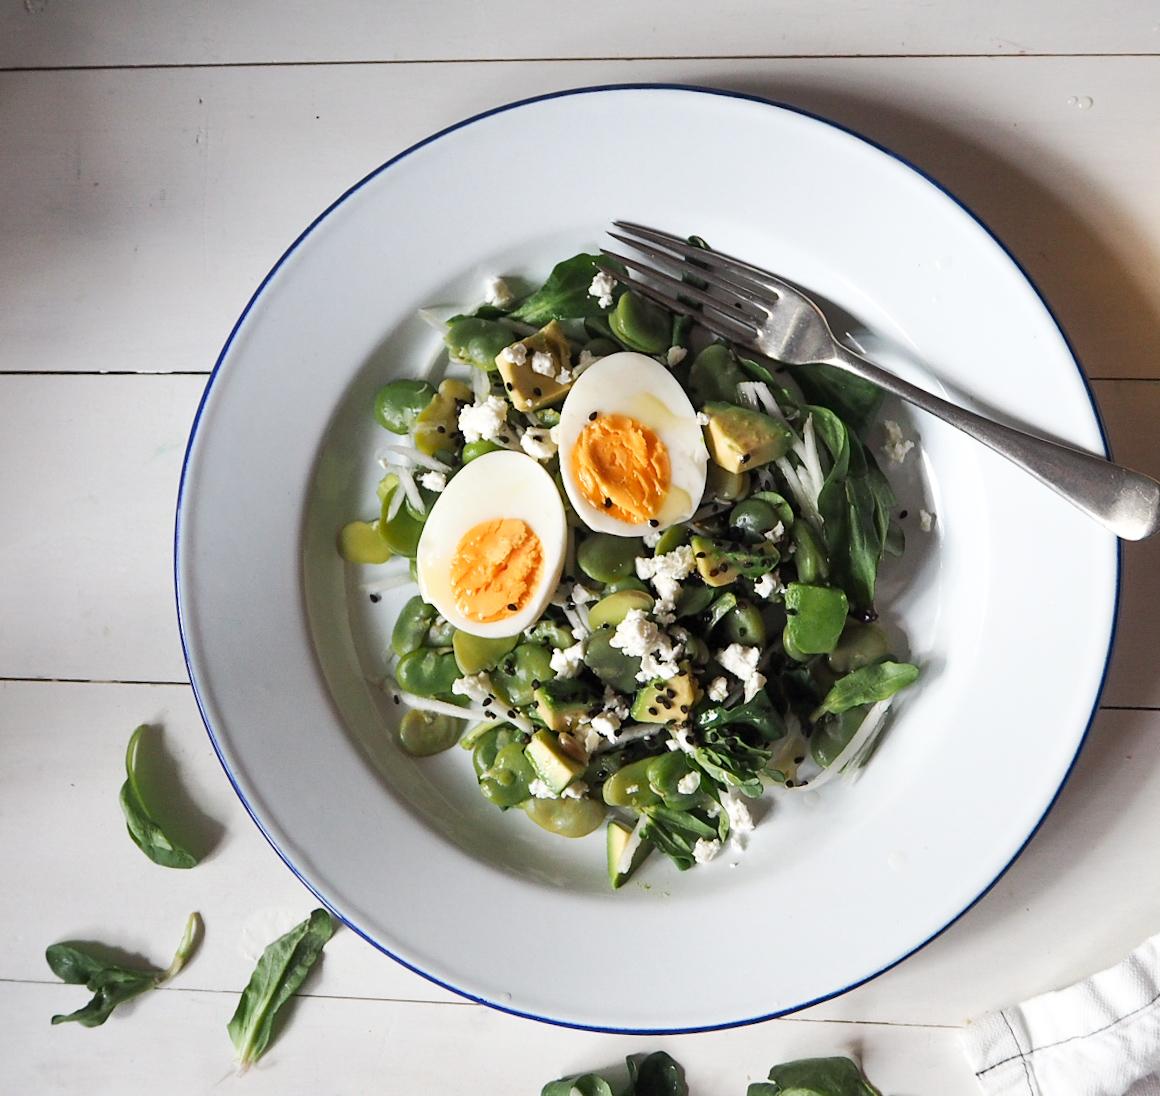 broadbean, egg and avocado salad